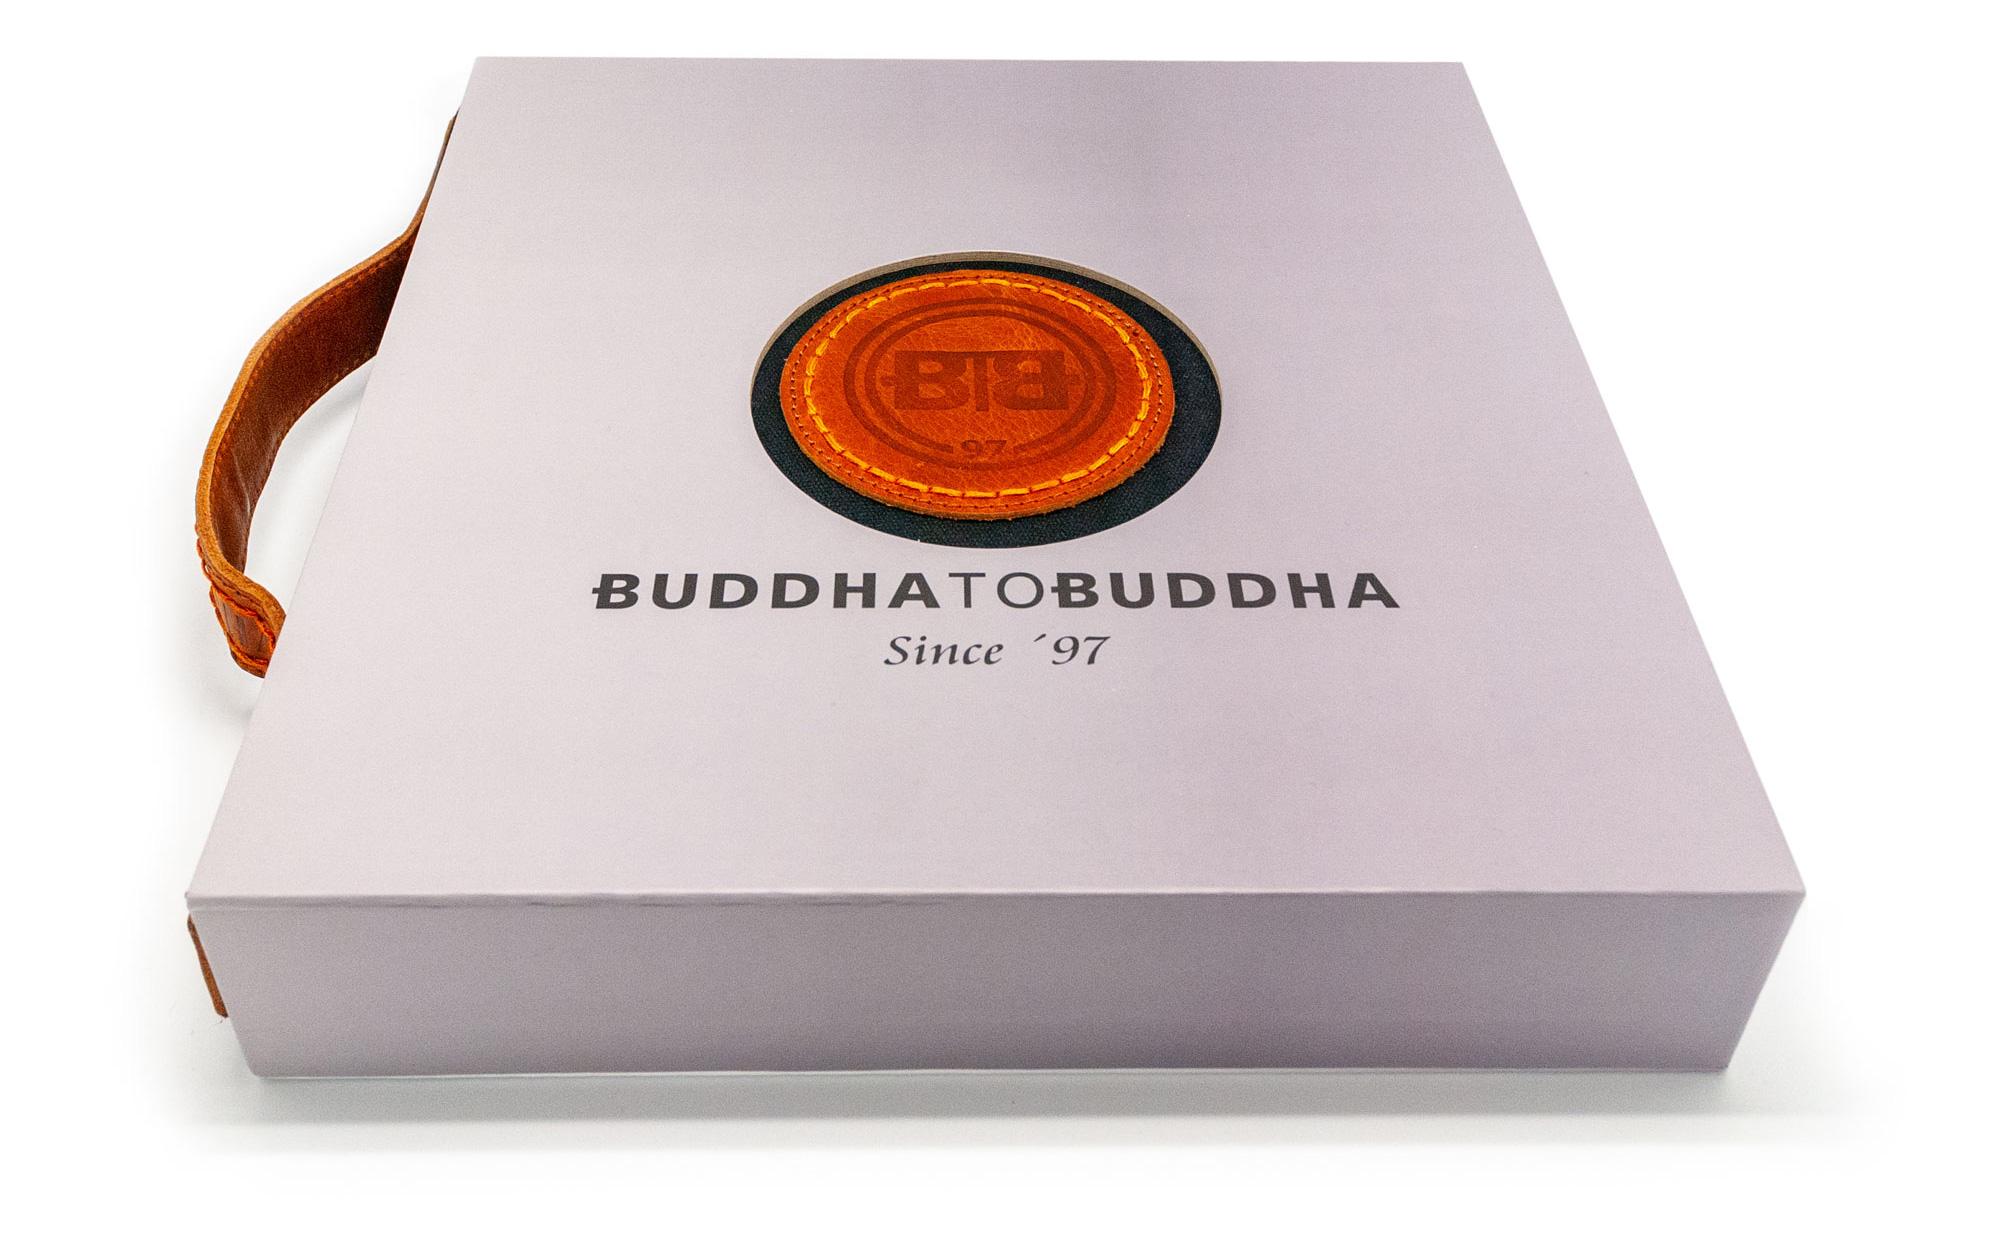 Buddha to Buddha - book and sleeve